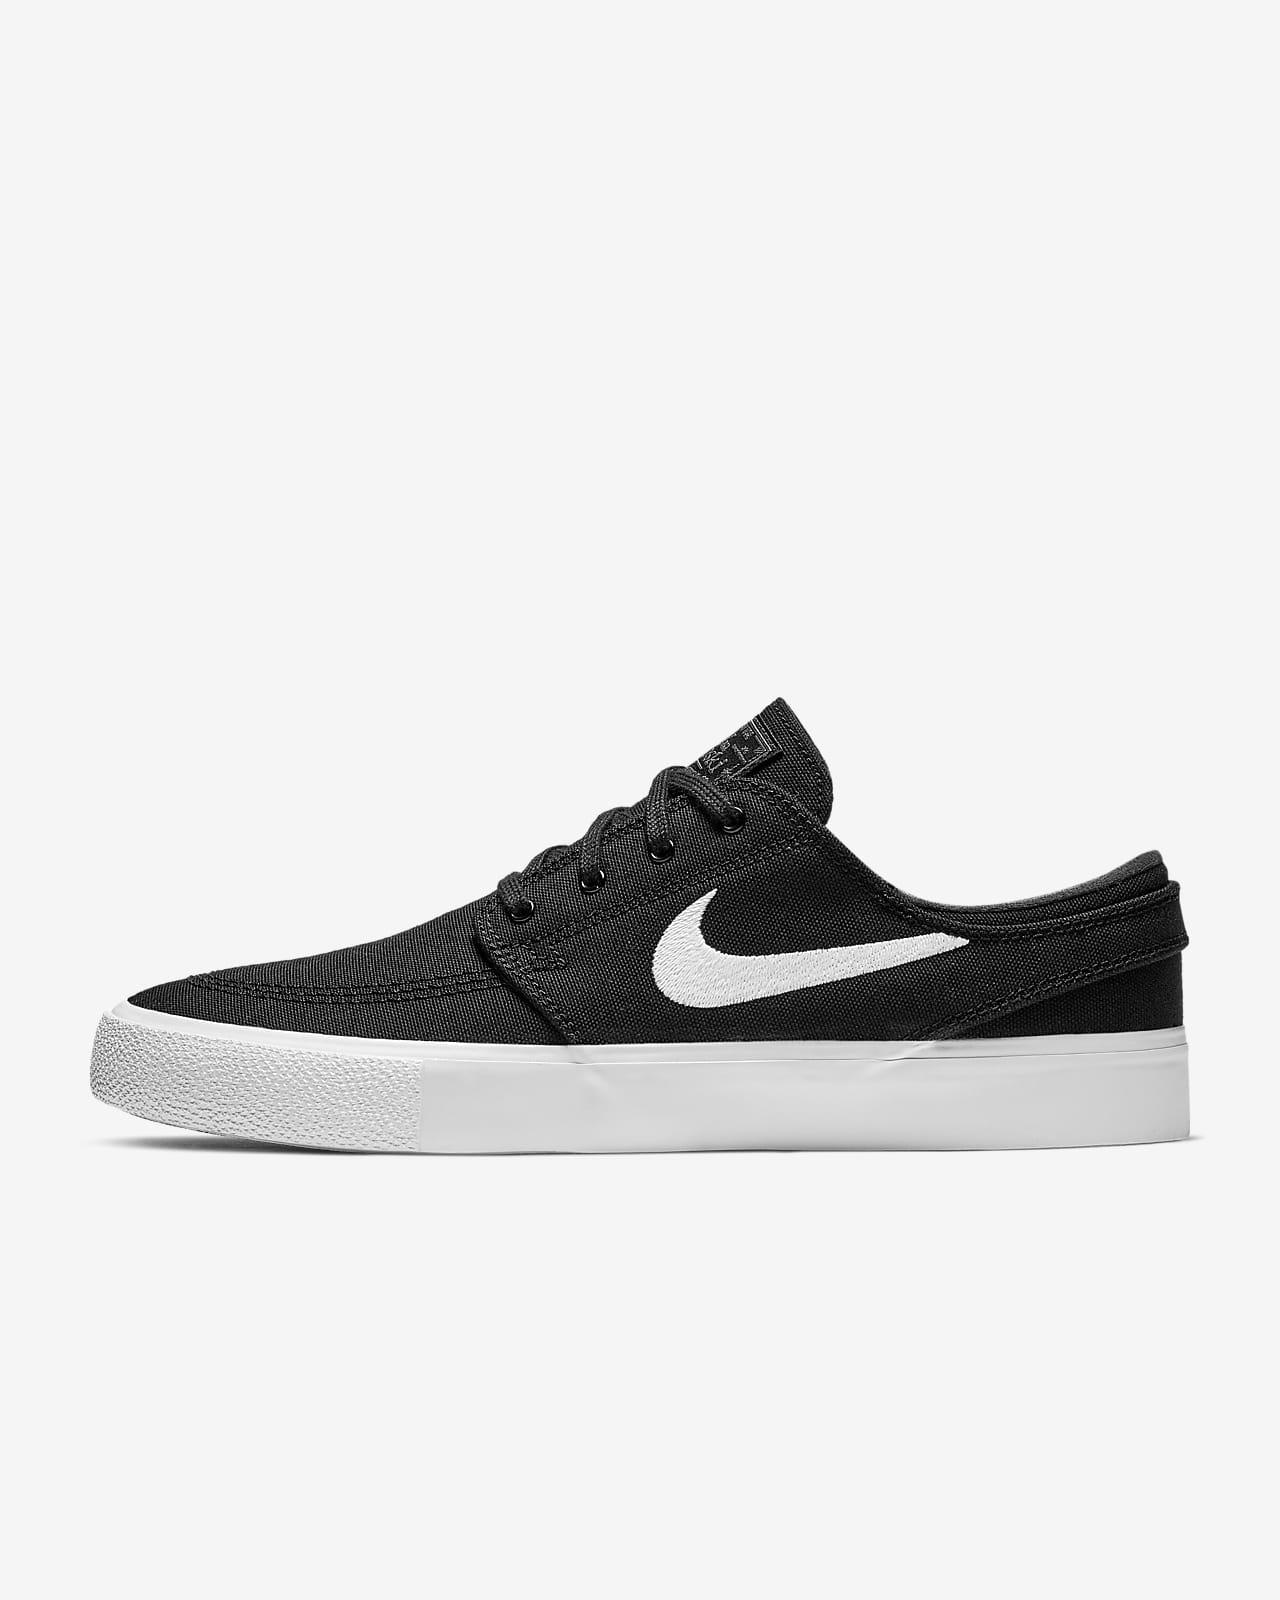 Calzado de skateboarding Nike SB Zoom Stefan Janoski Canvas RM